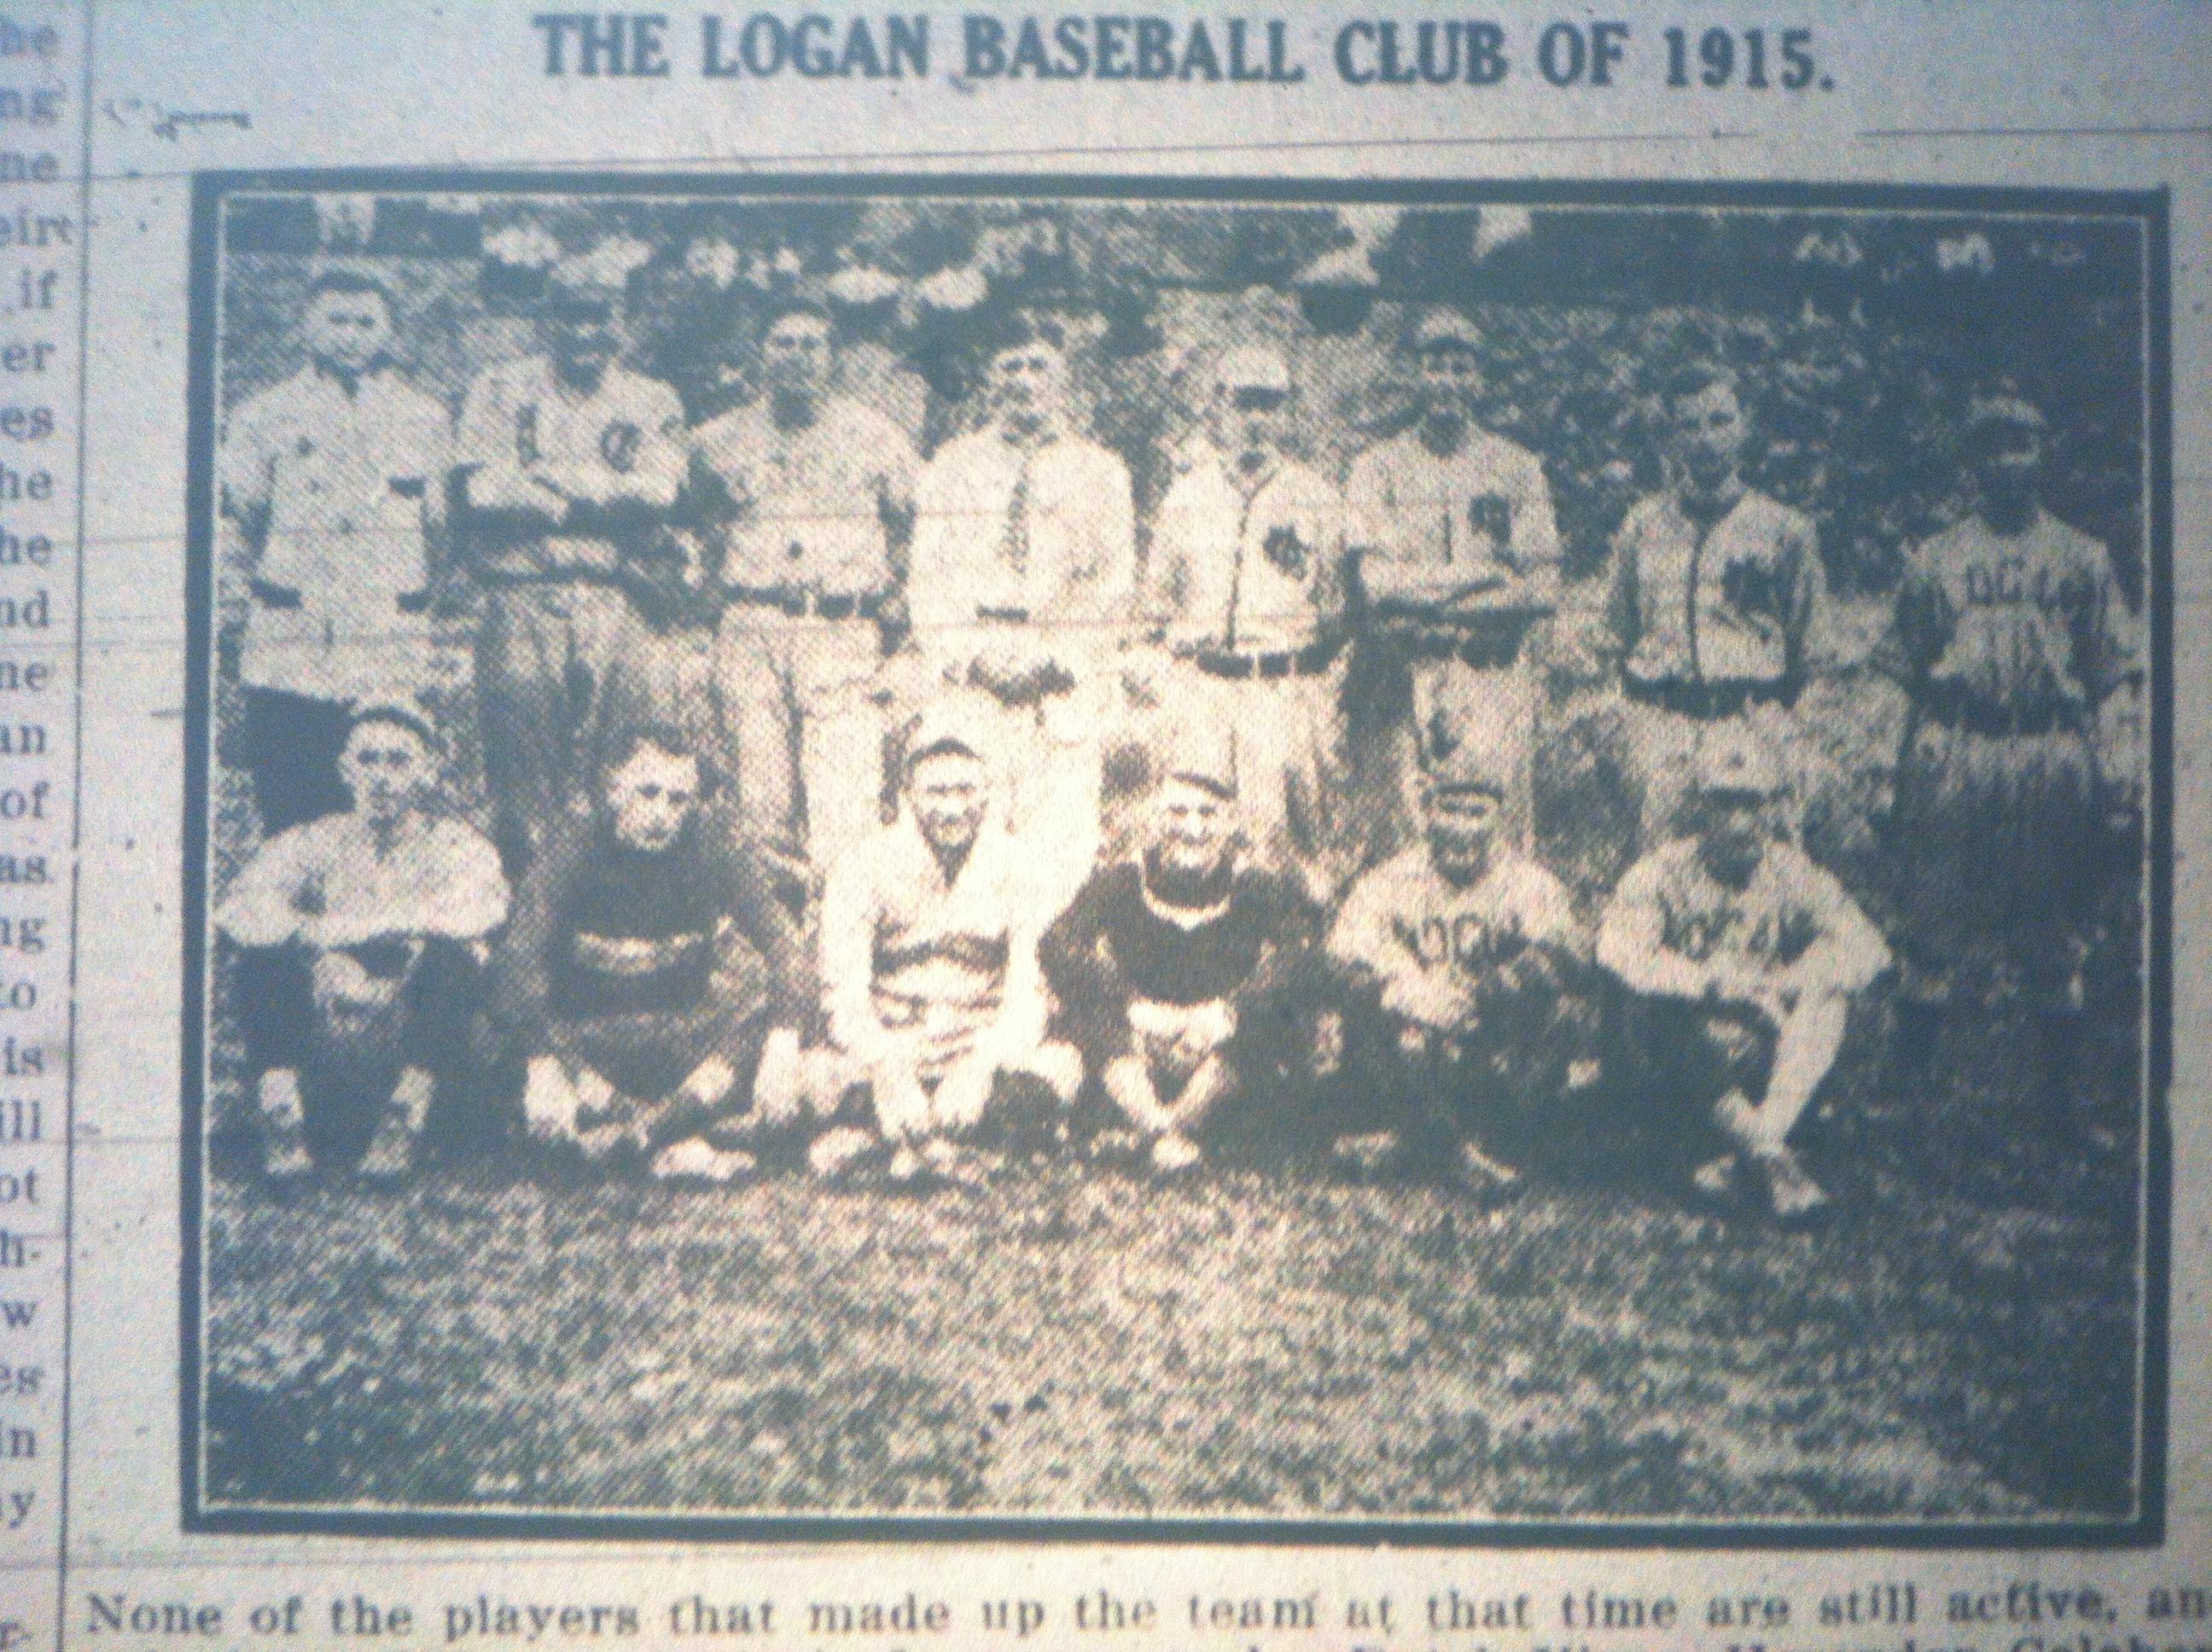 logan-baseball-team-1915-lb-04-09-1926-3